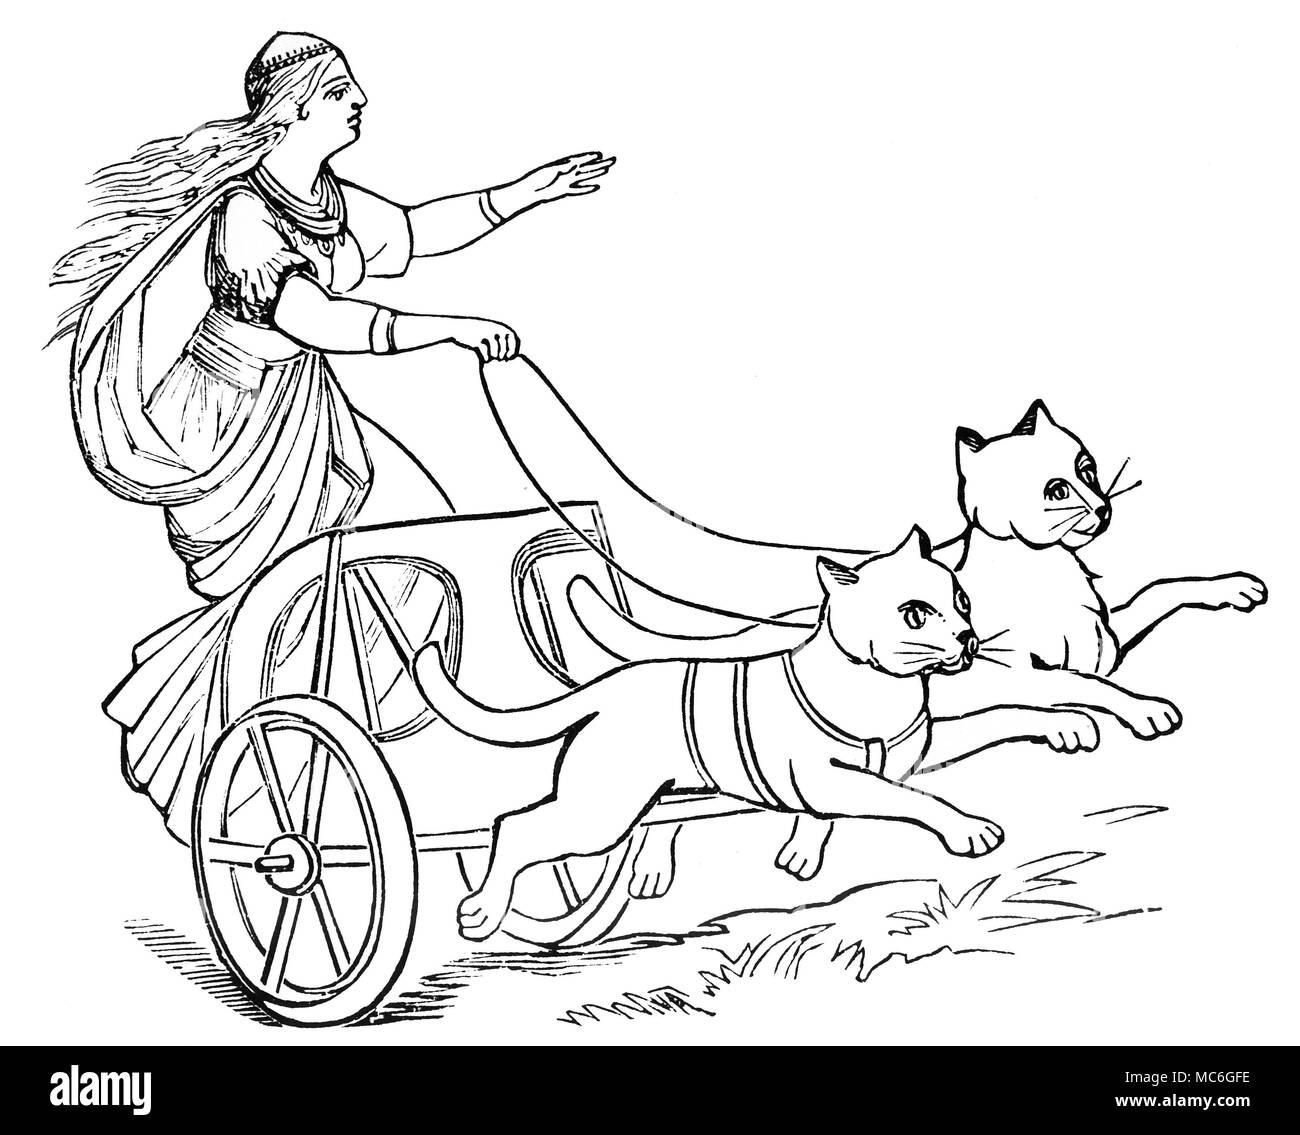 Teutonic Mythology Freya The Goddess Freya In Her Chariot